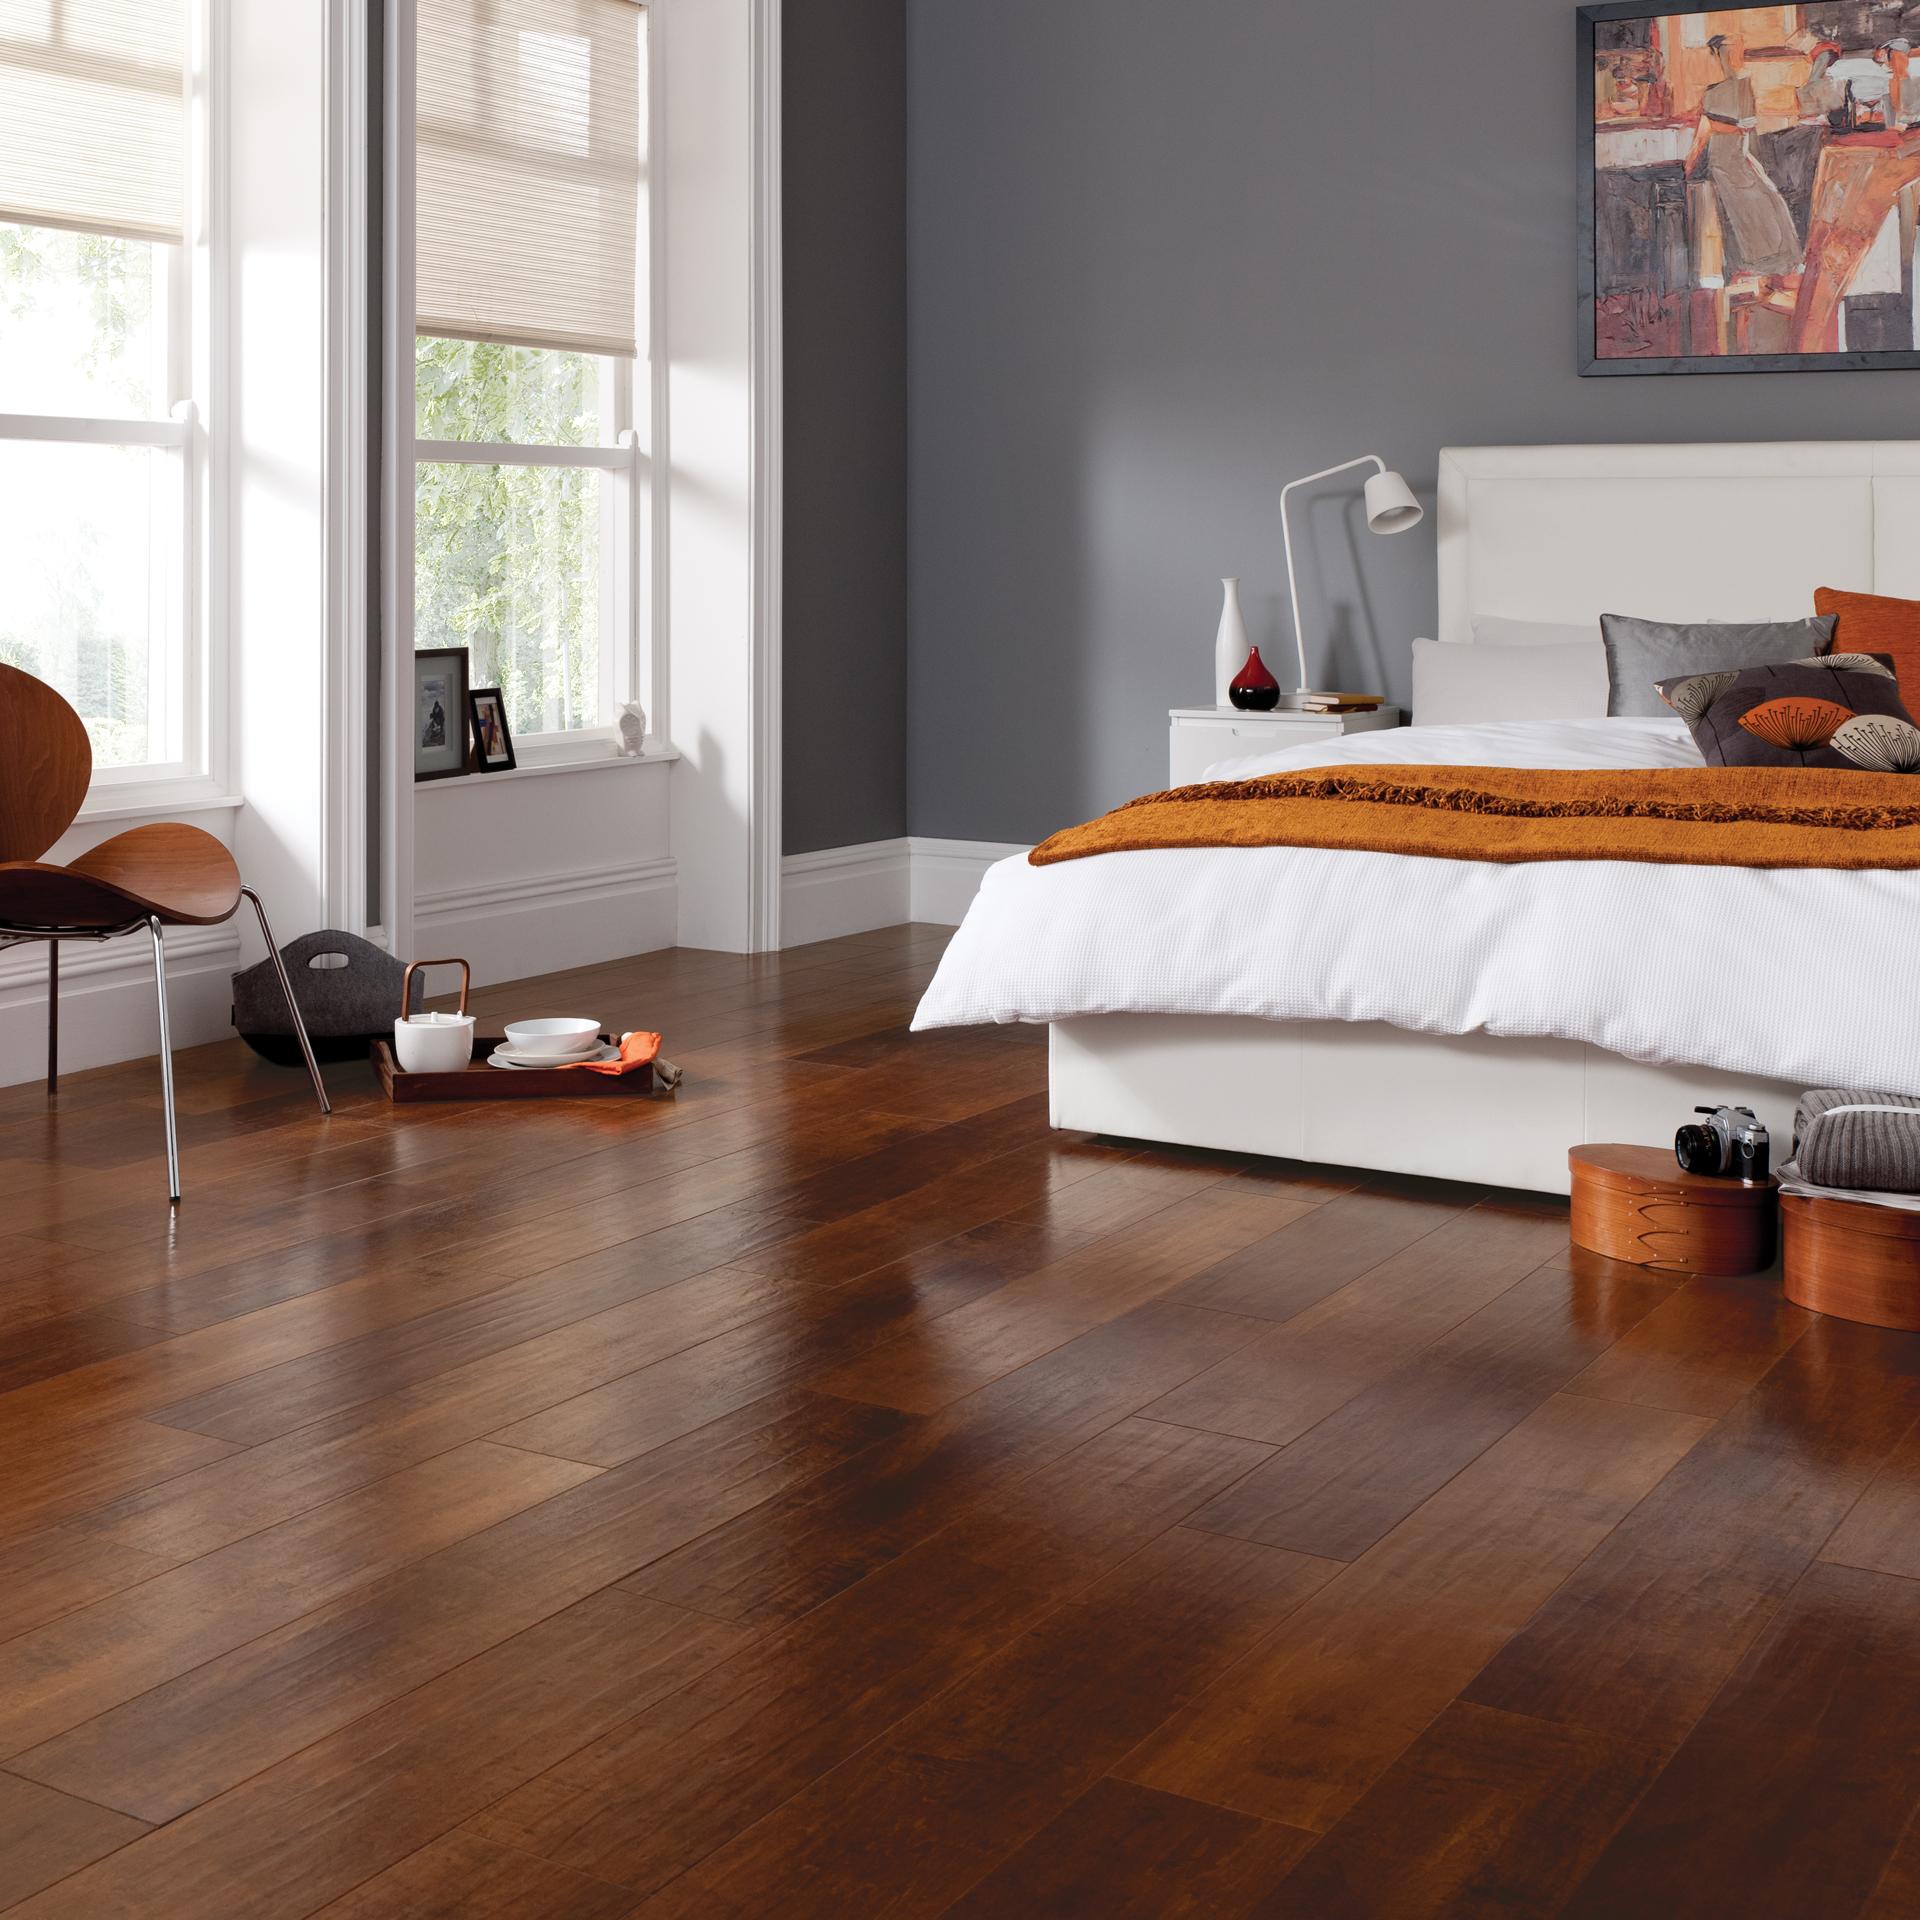 RL07 Santina Cherry Bedroom Flooring - Art Select